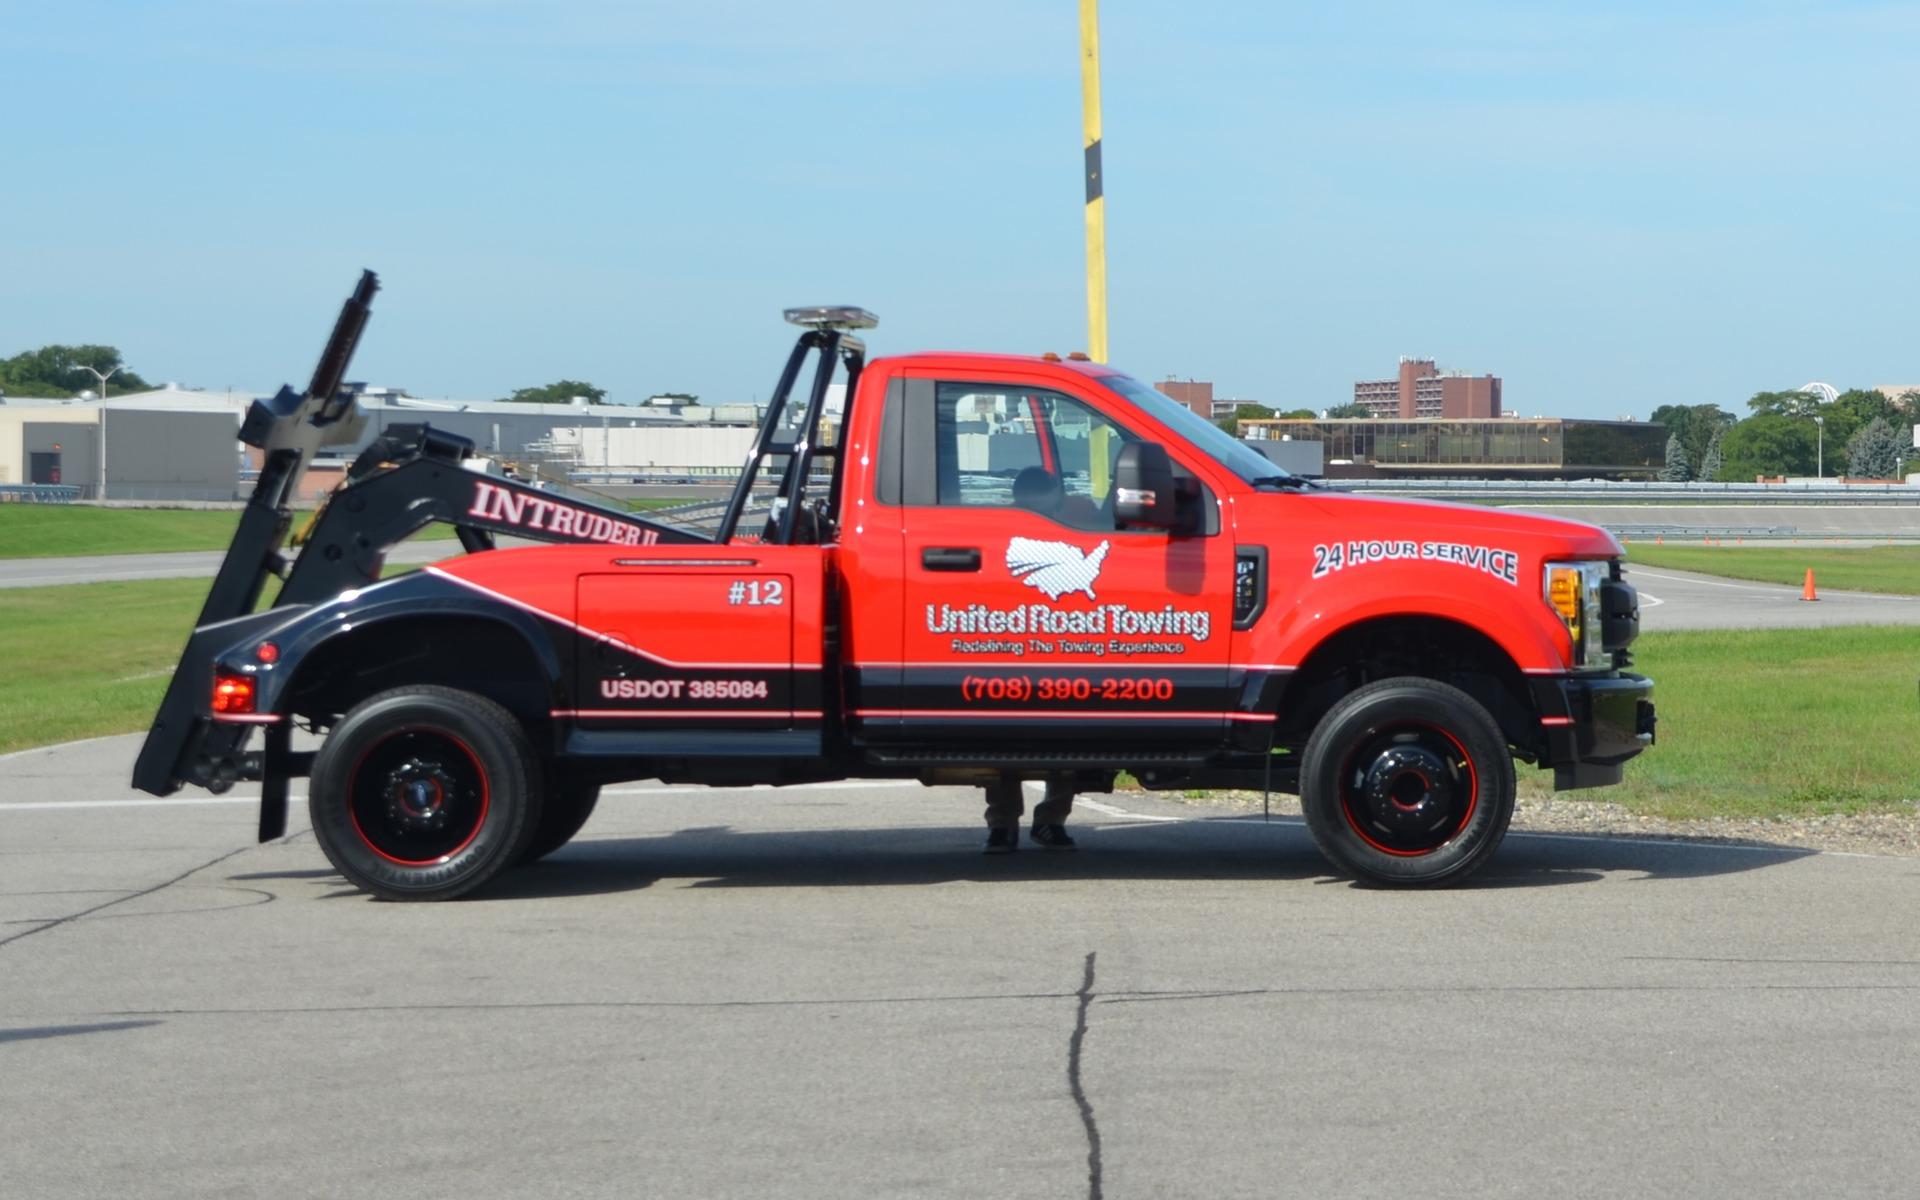 Ford Towing Guide >> Visite chez Ford, de la Ford Model A au Tonka! - 12/19